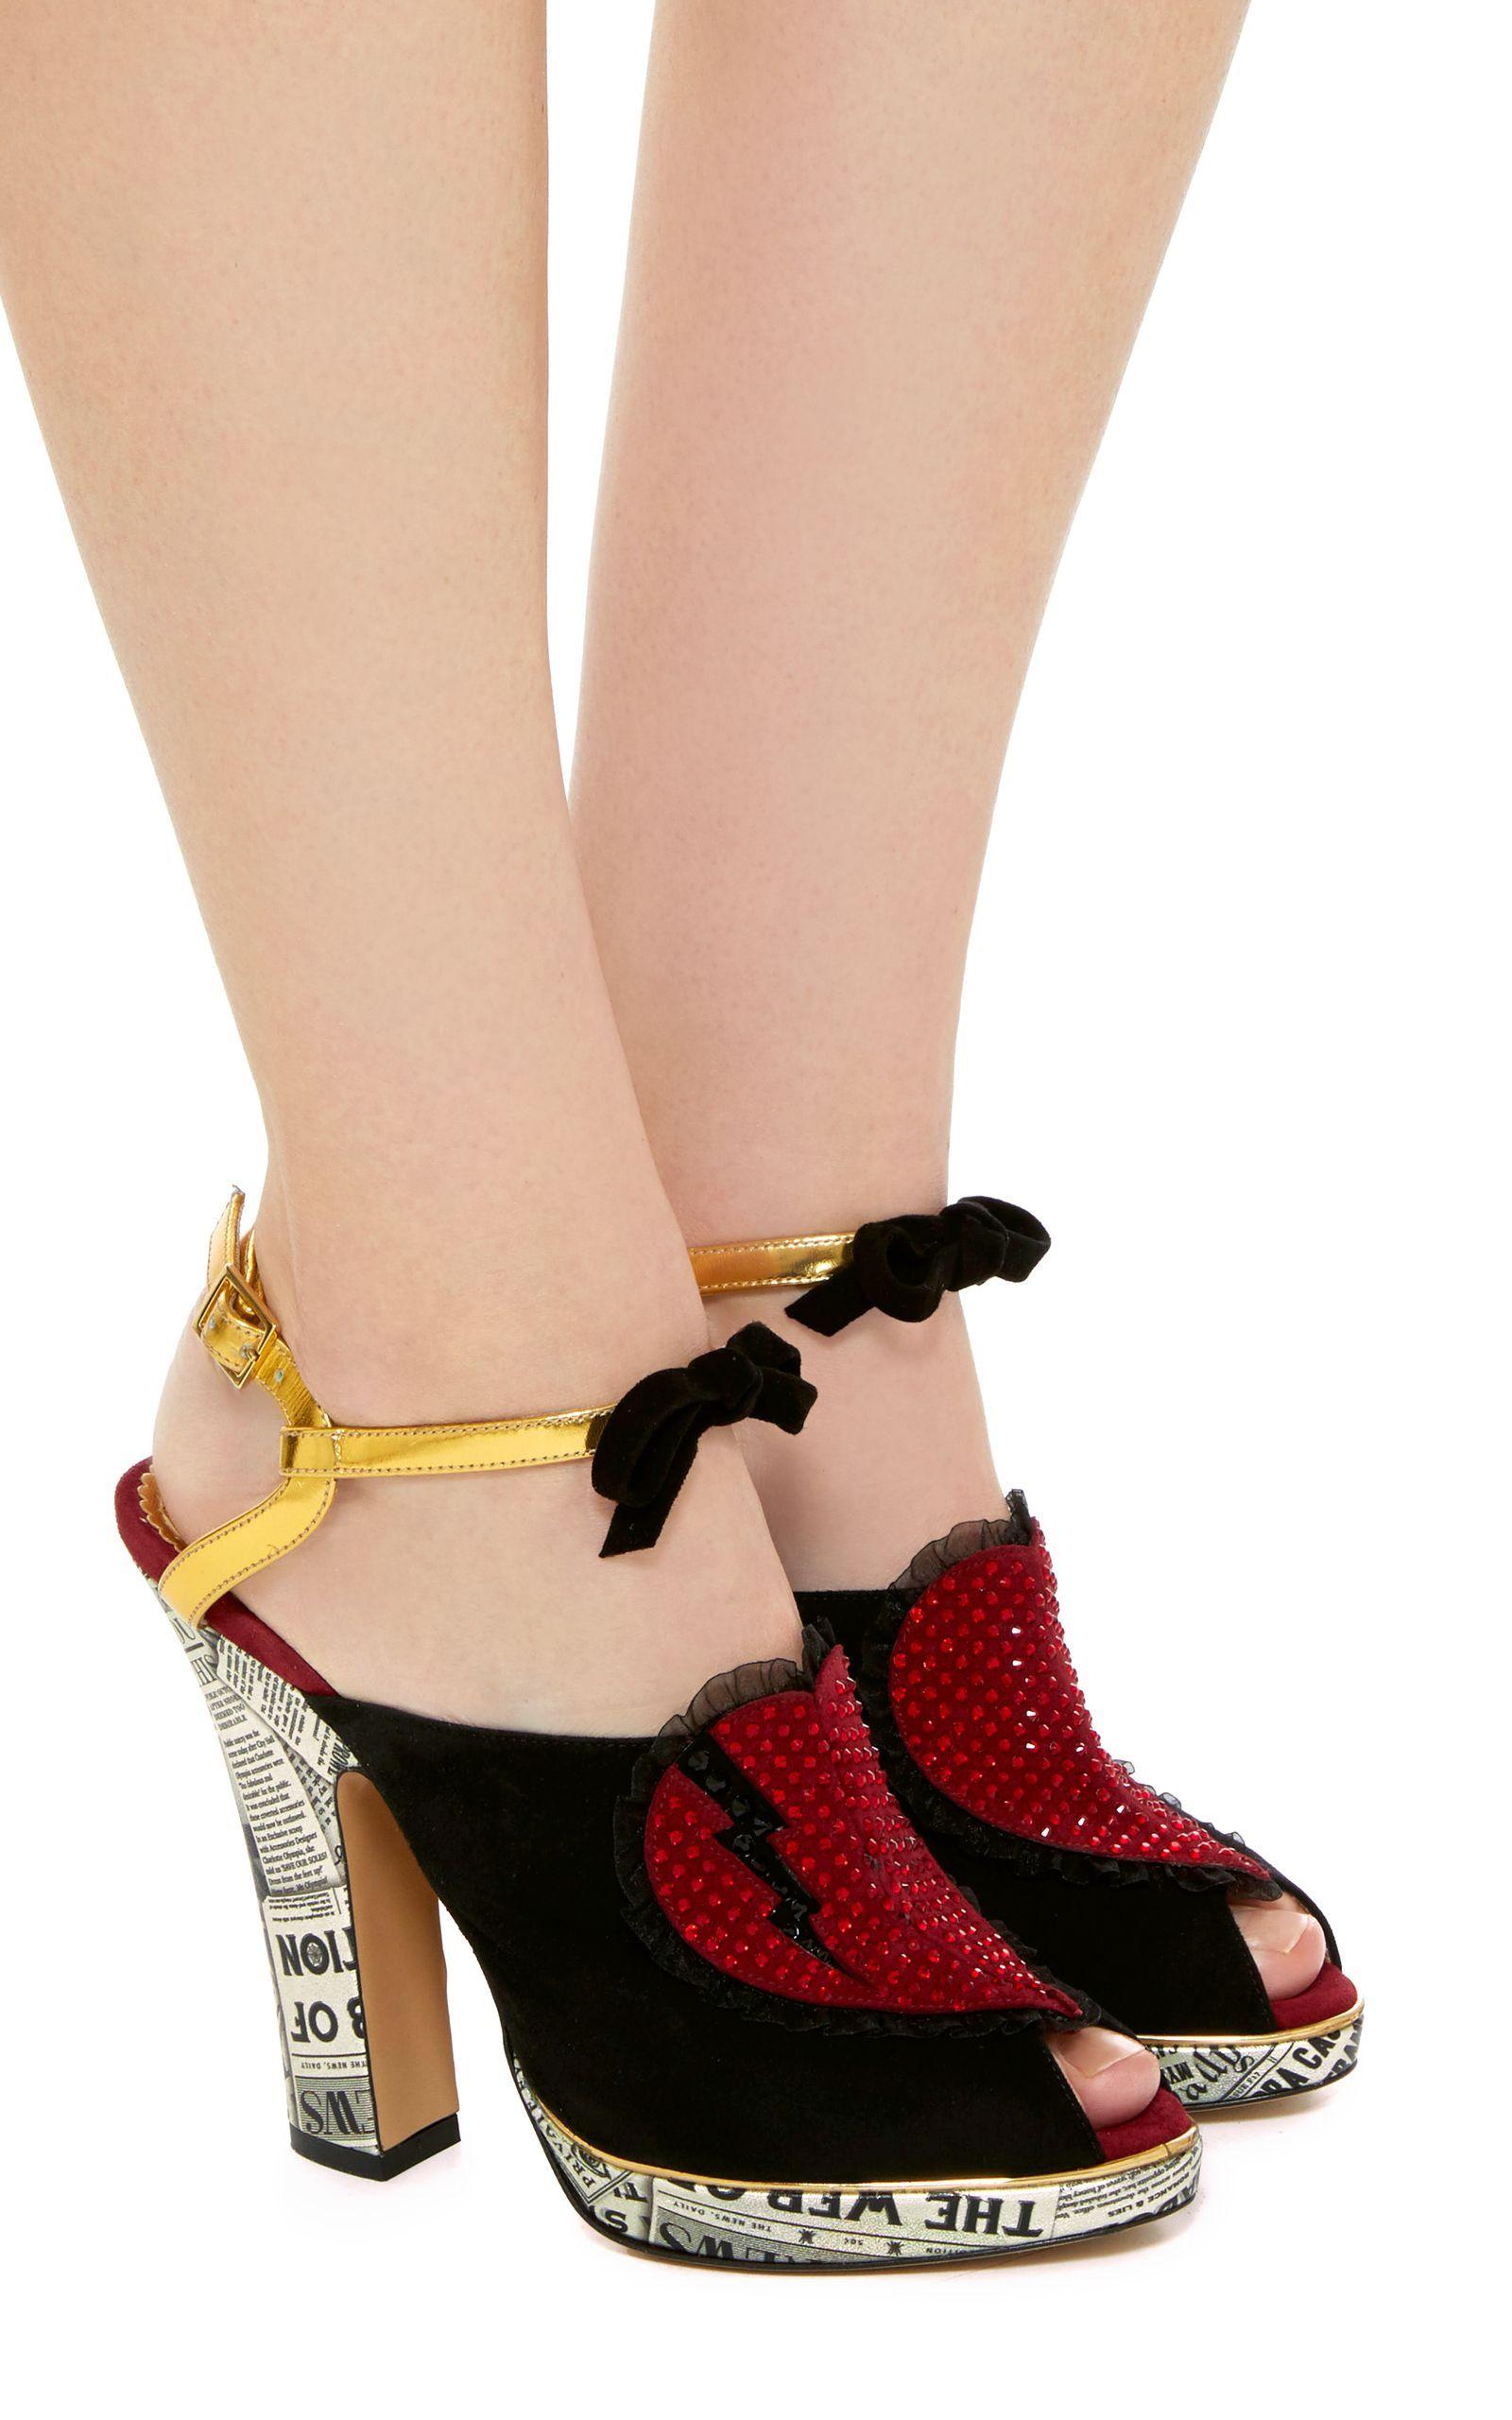 1872f4232c Charlotte Olympia Killer Heels  